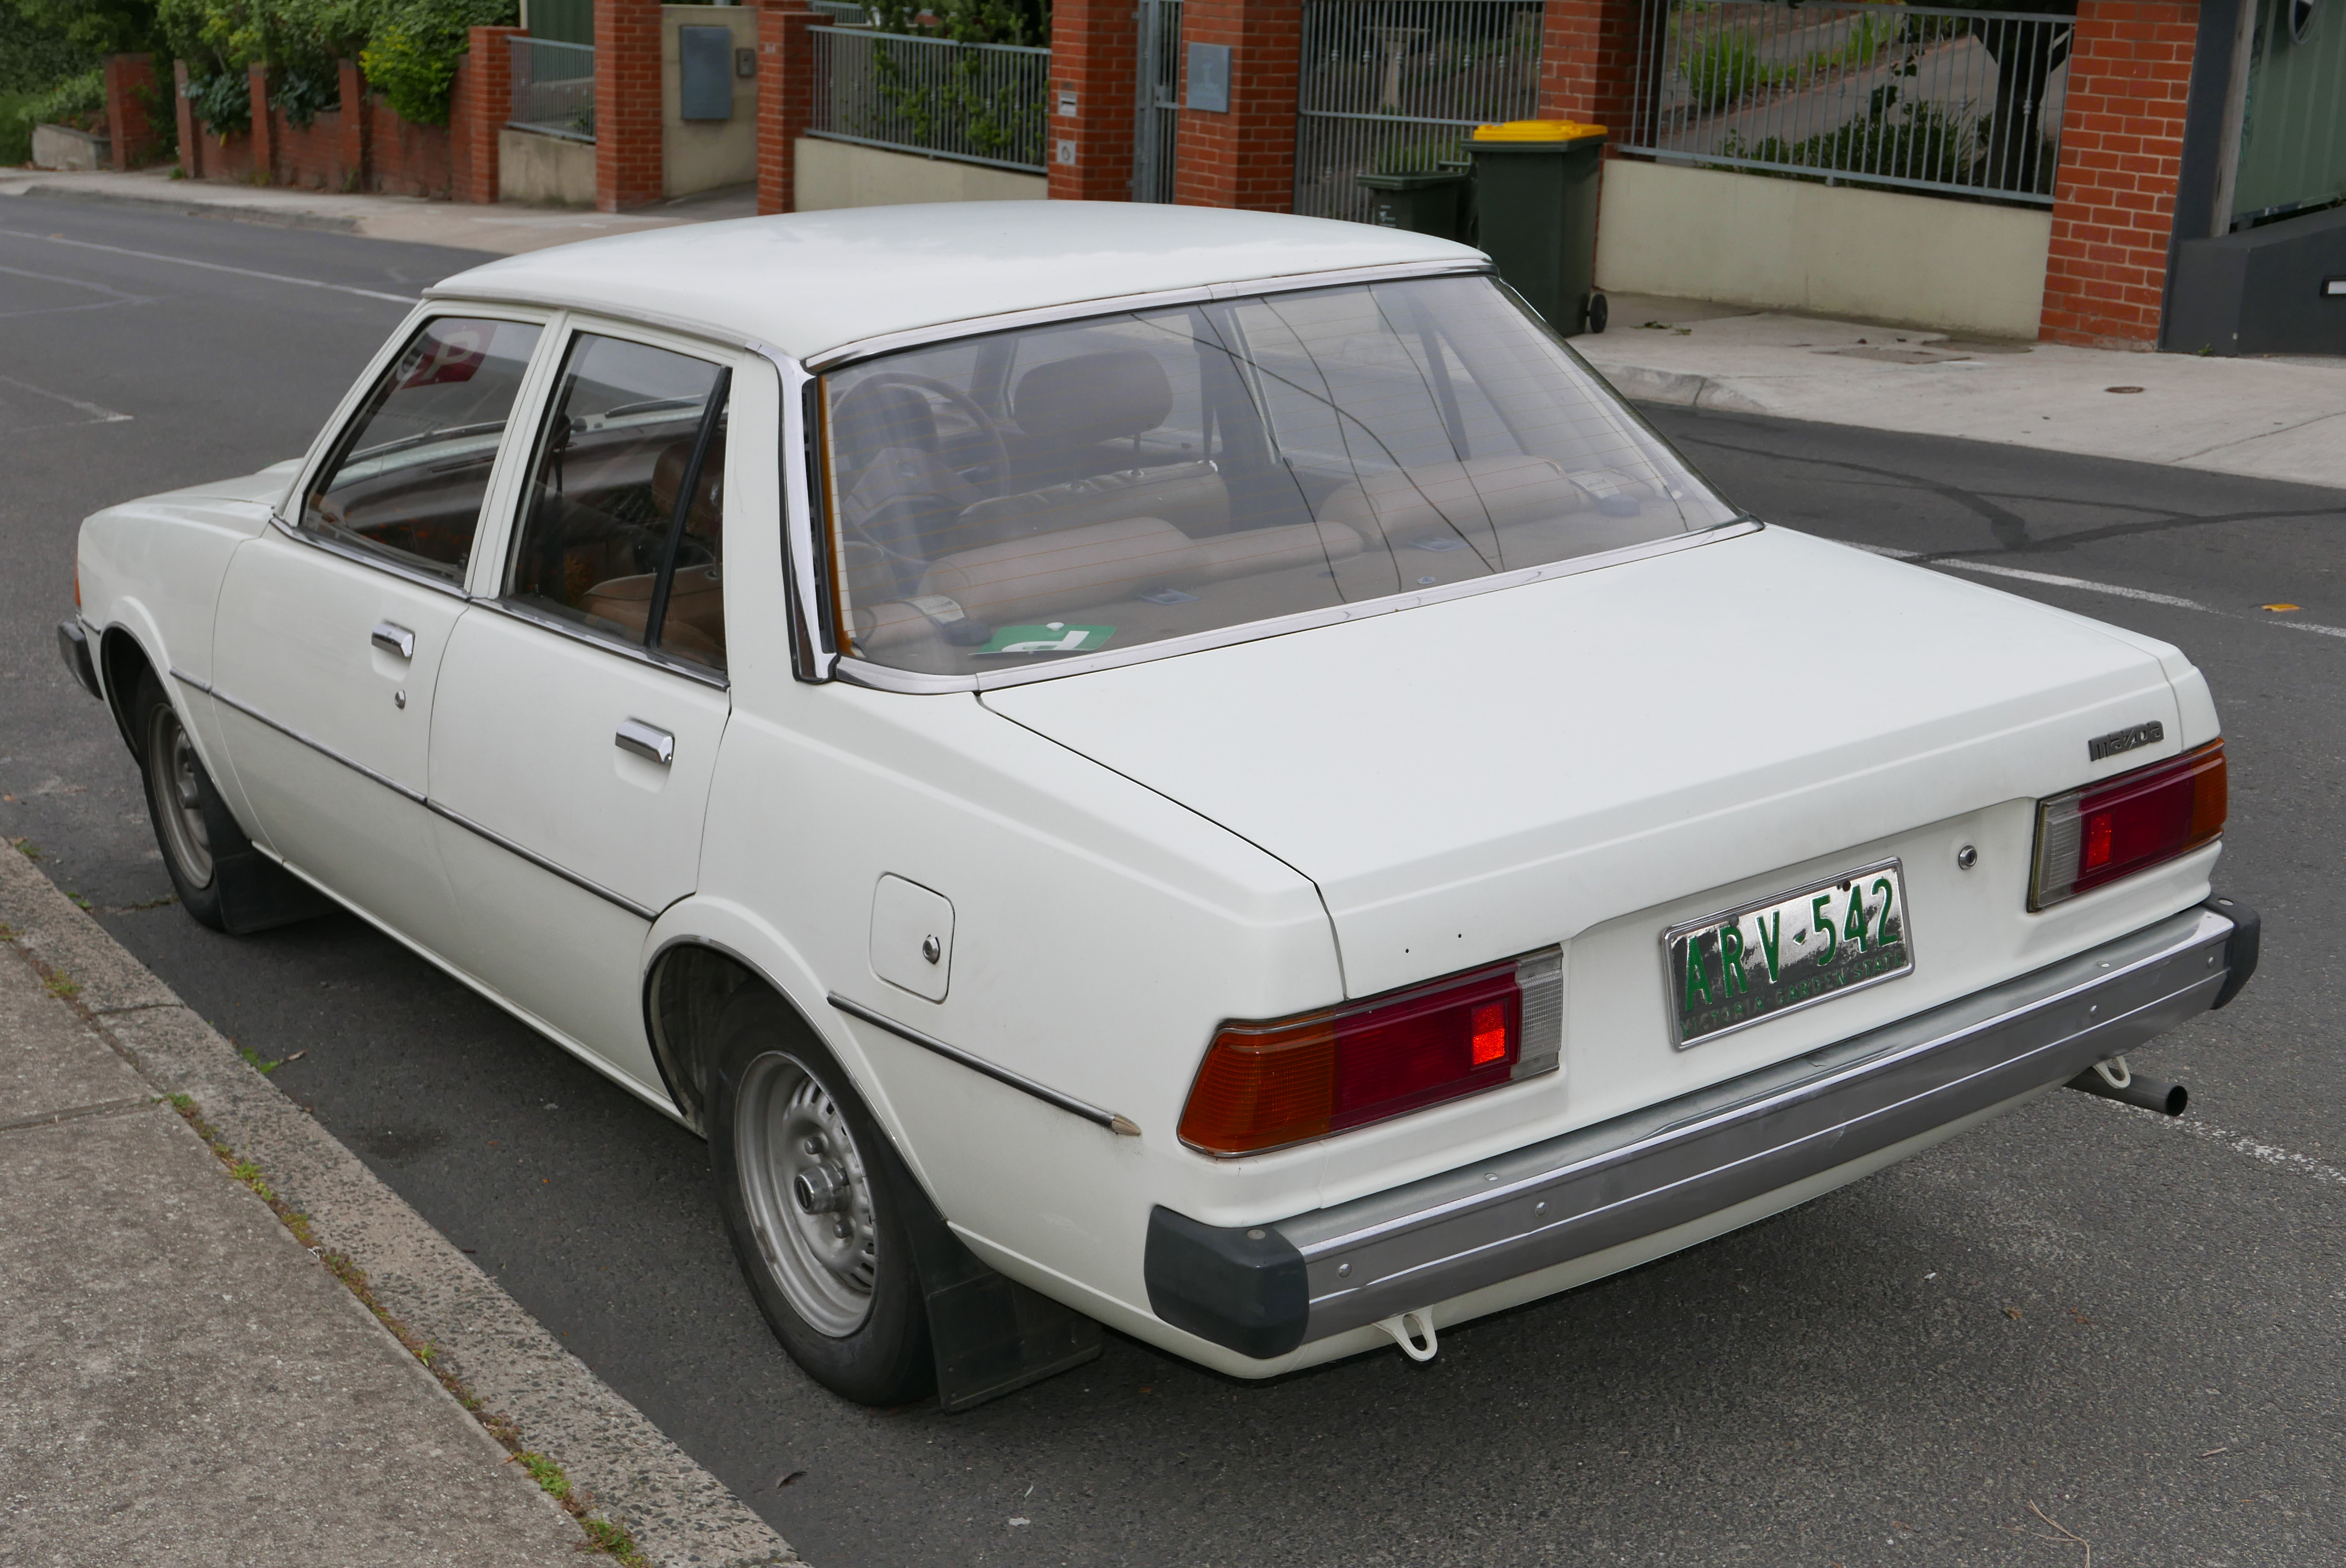 1978 Bel Air Chevrolet Mazda I Sedan Outstanding Cars 4272x2856